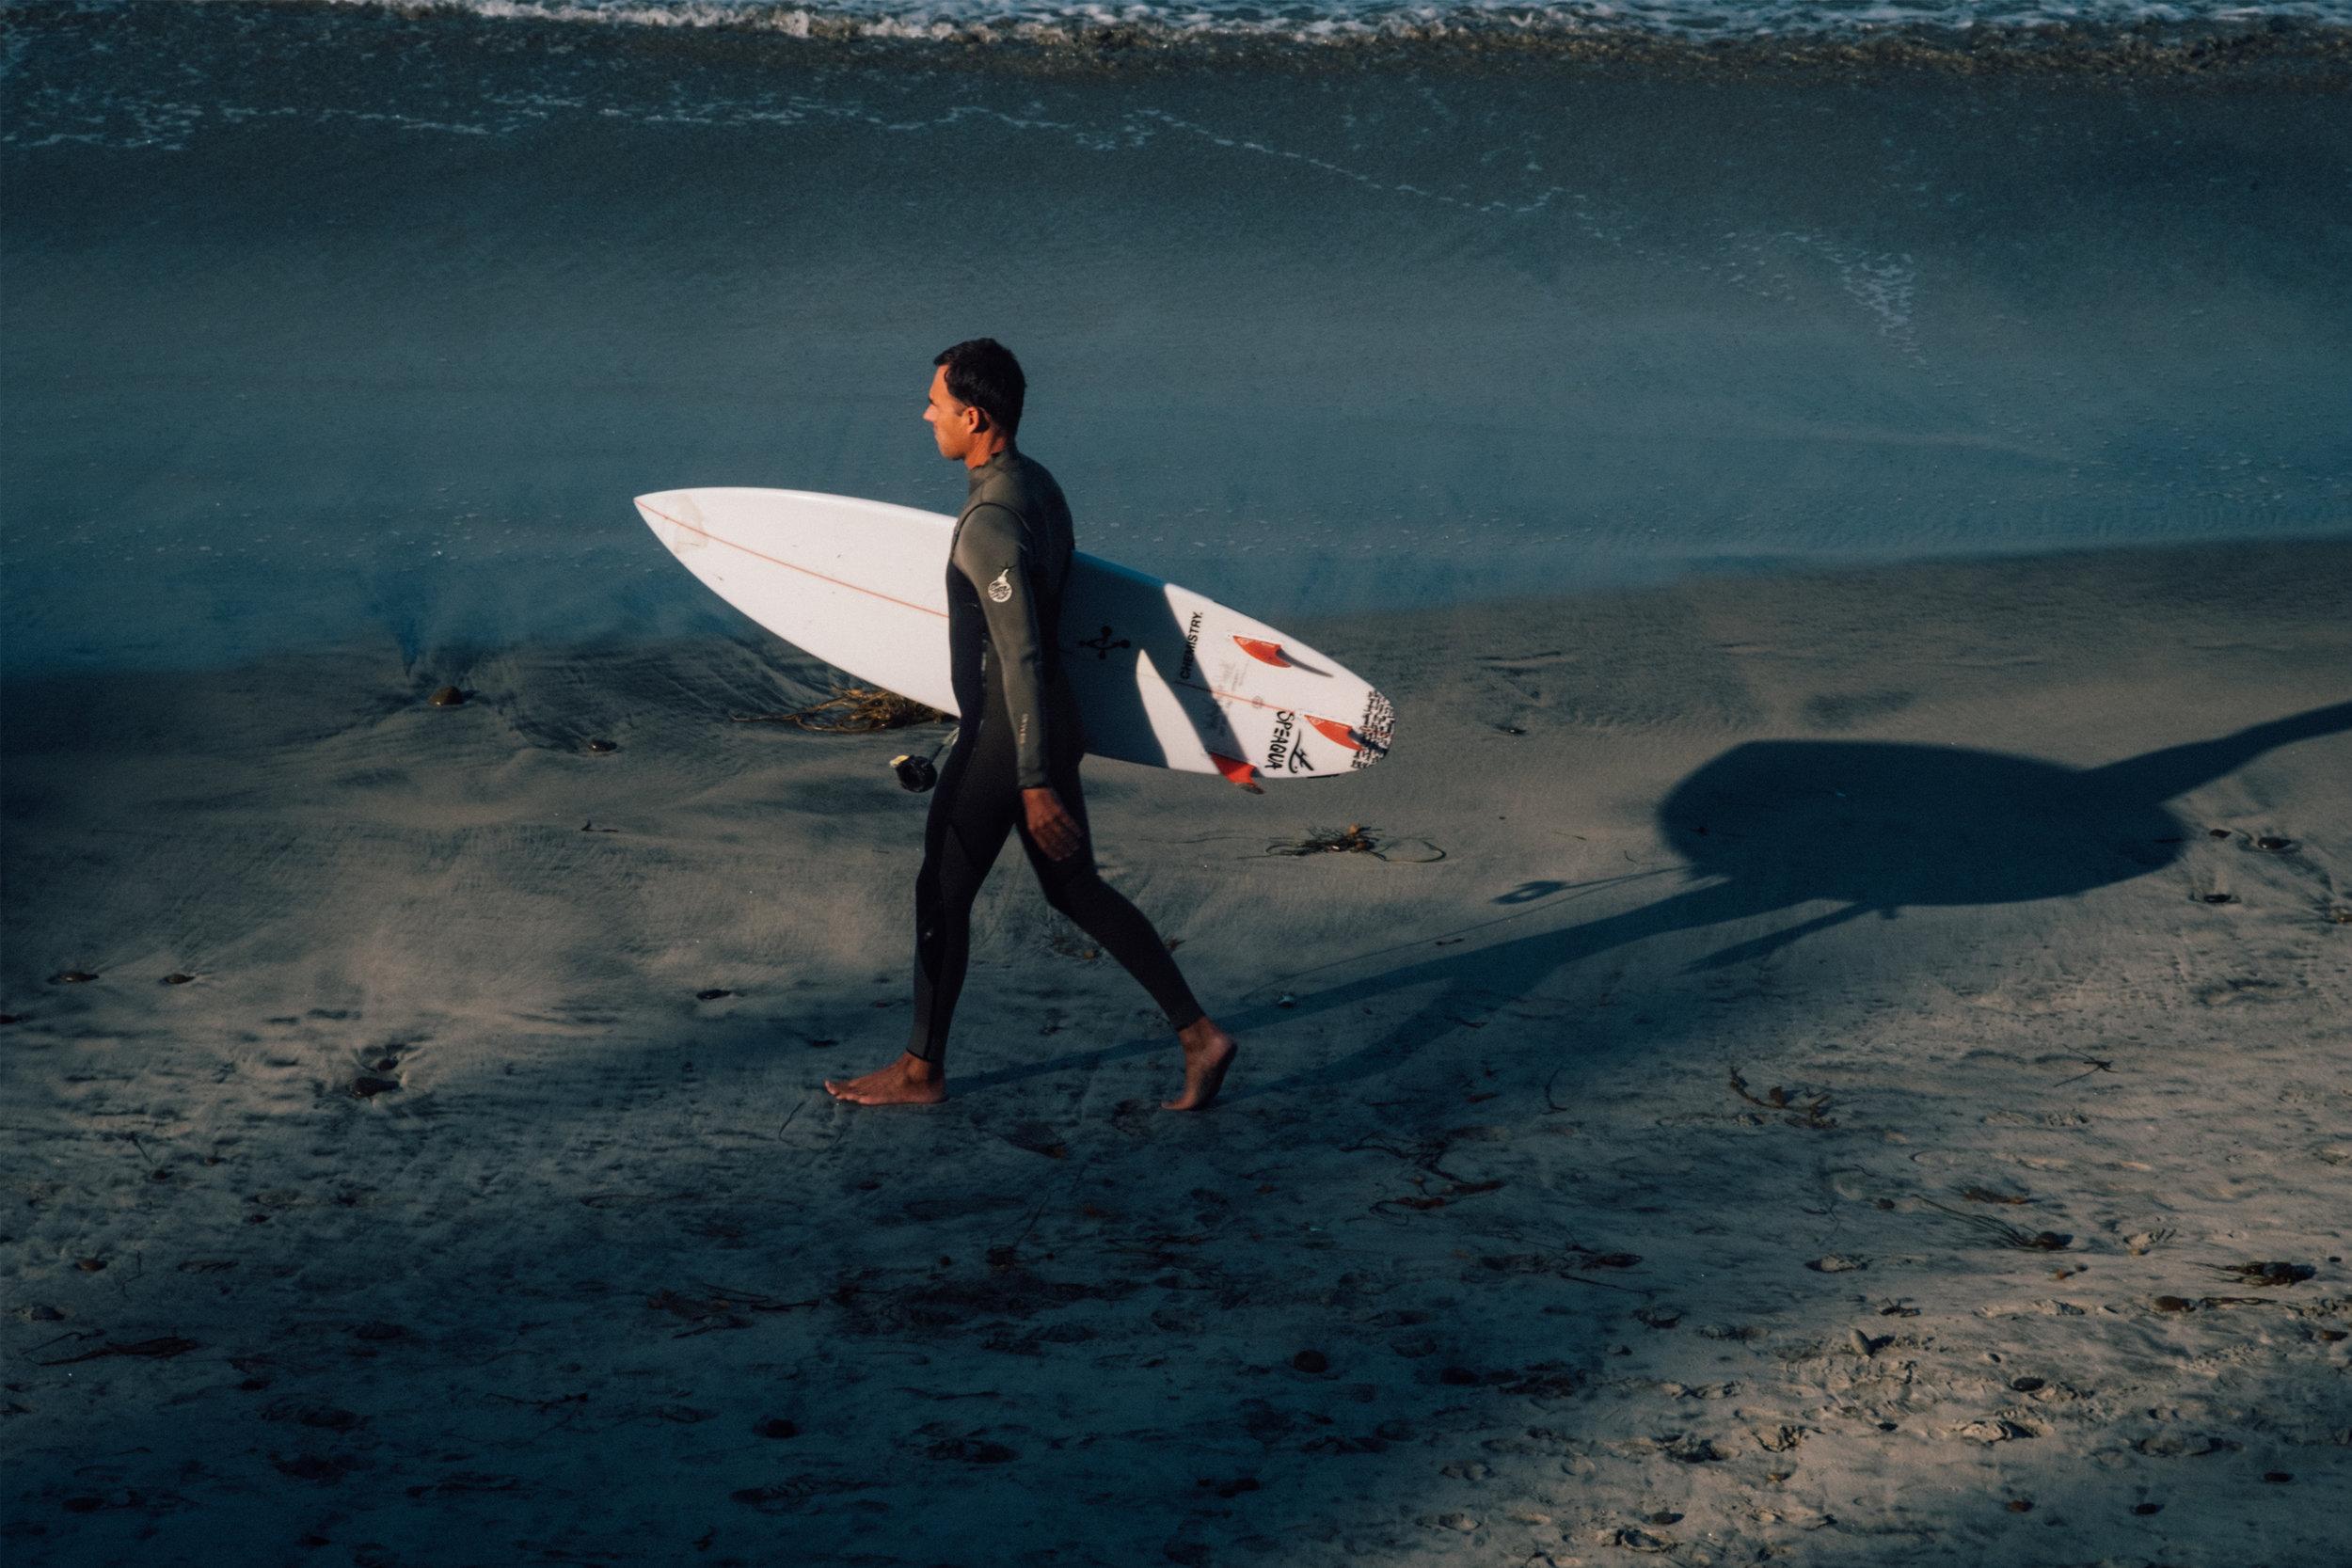 Surf11.jpg